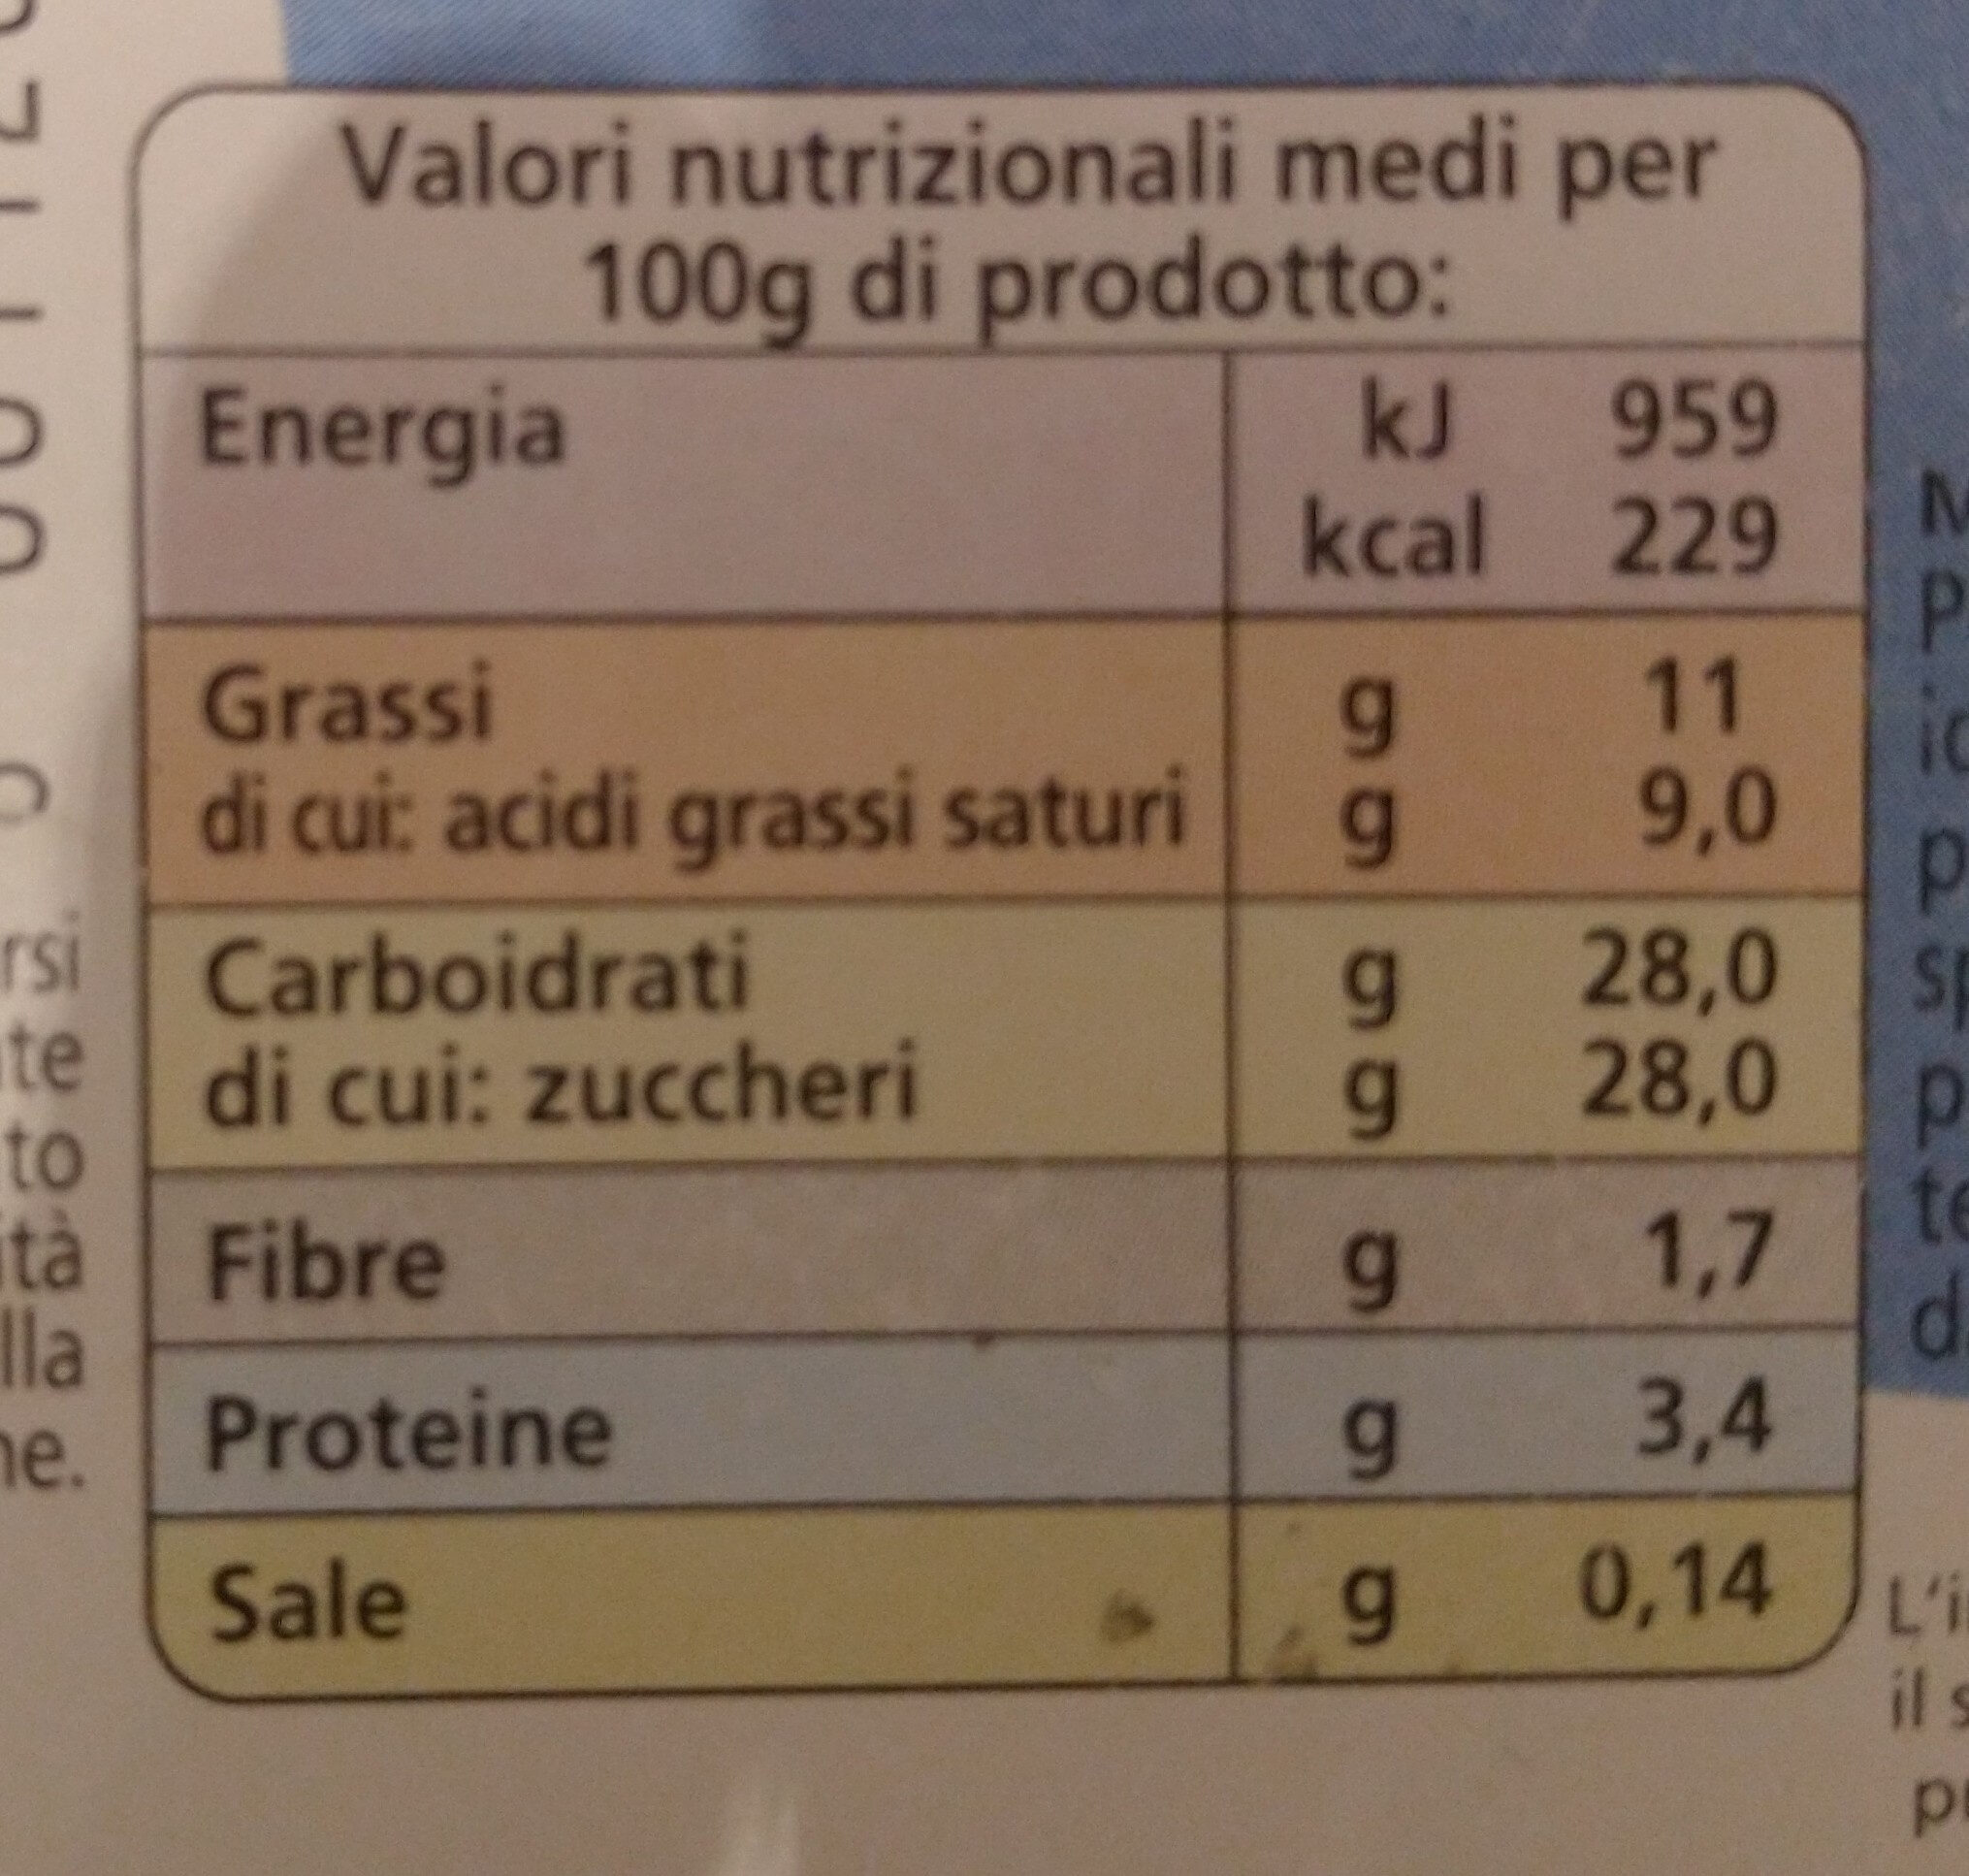 affogato al cioccolato - Nährwertangaben - it